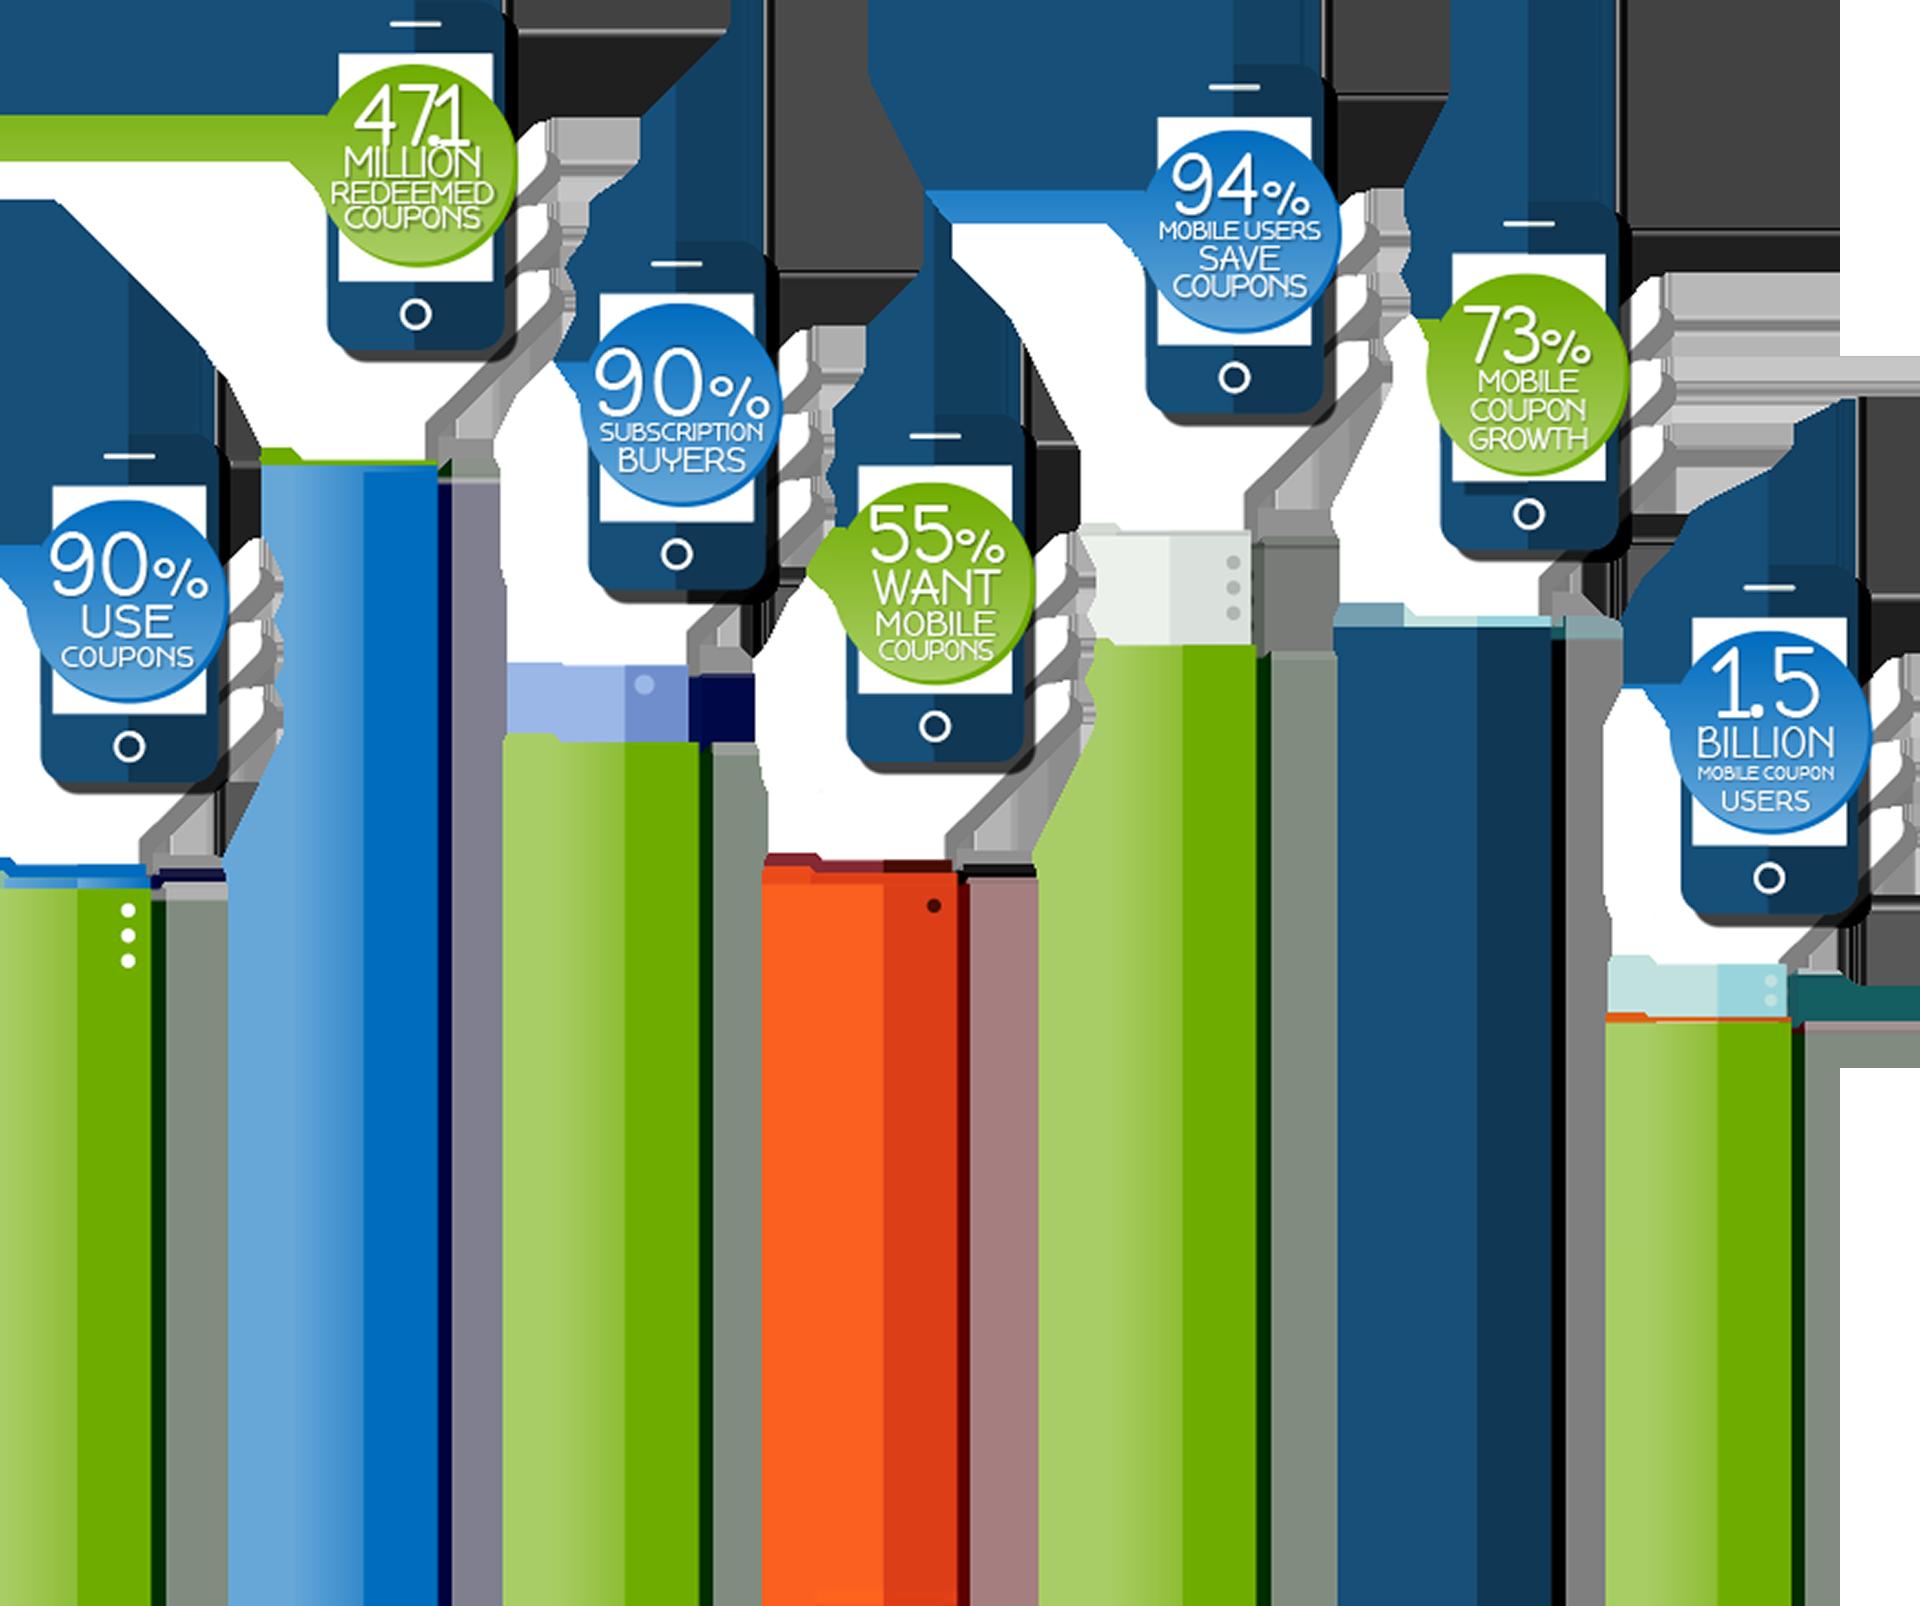 mobile statistics image